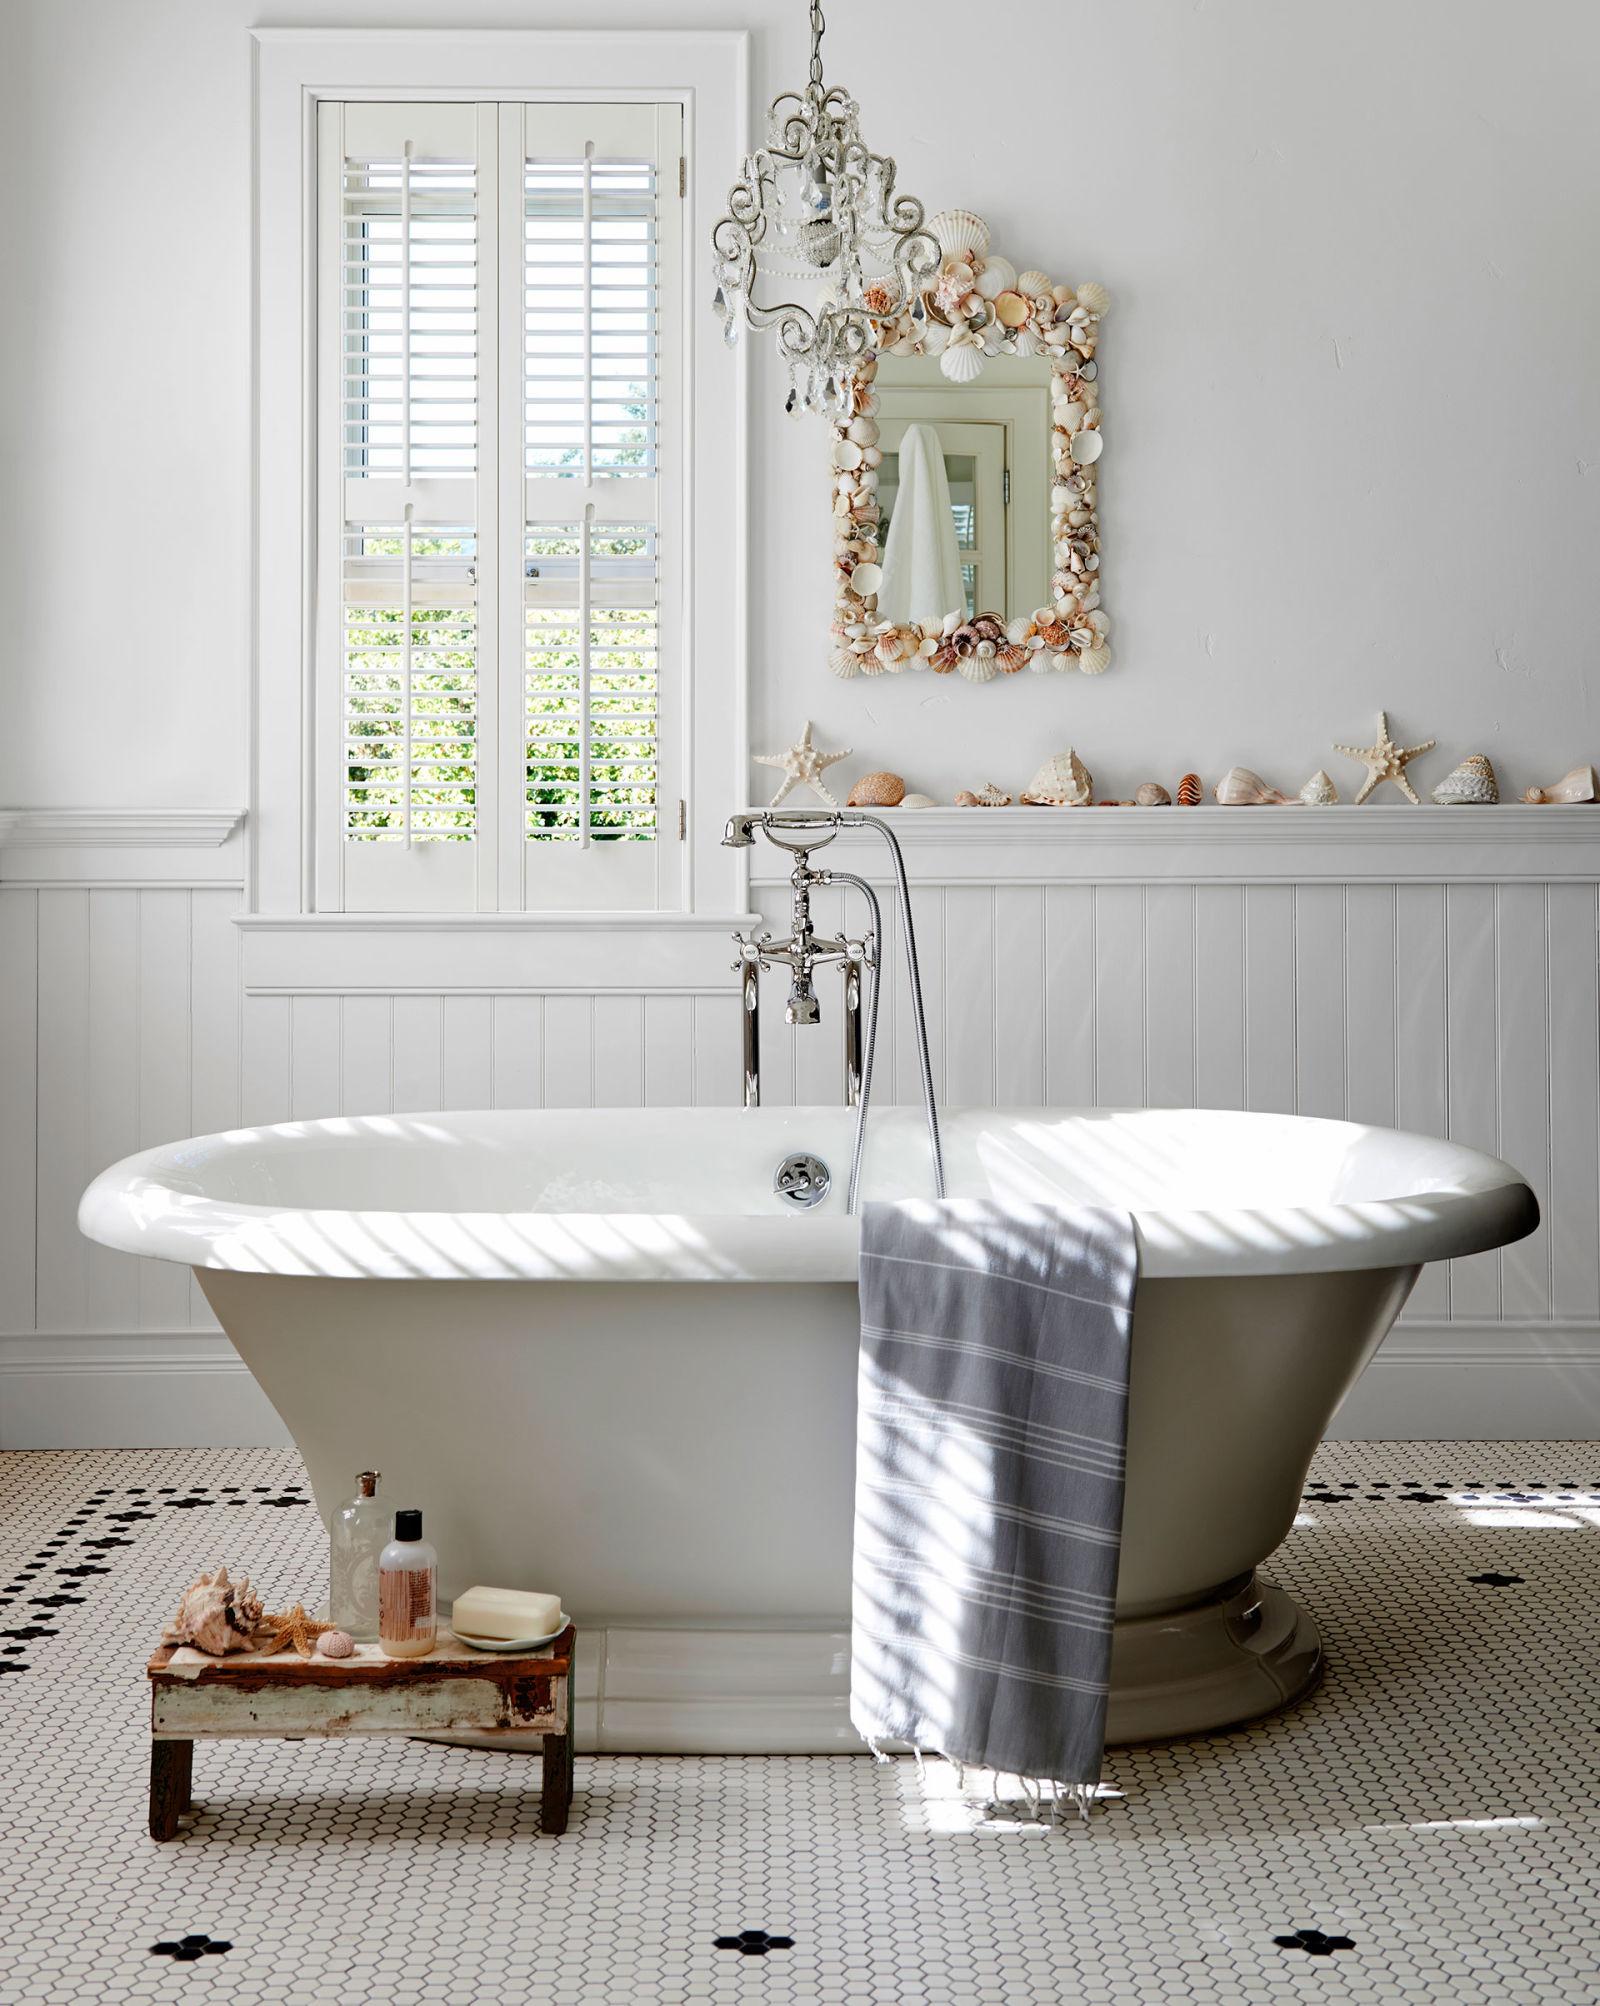 30 great pictures and ideas classic bathroom tile design ... on Farmhouse Tile Bathroom Floor  id=13891